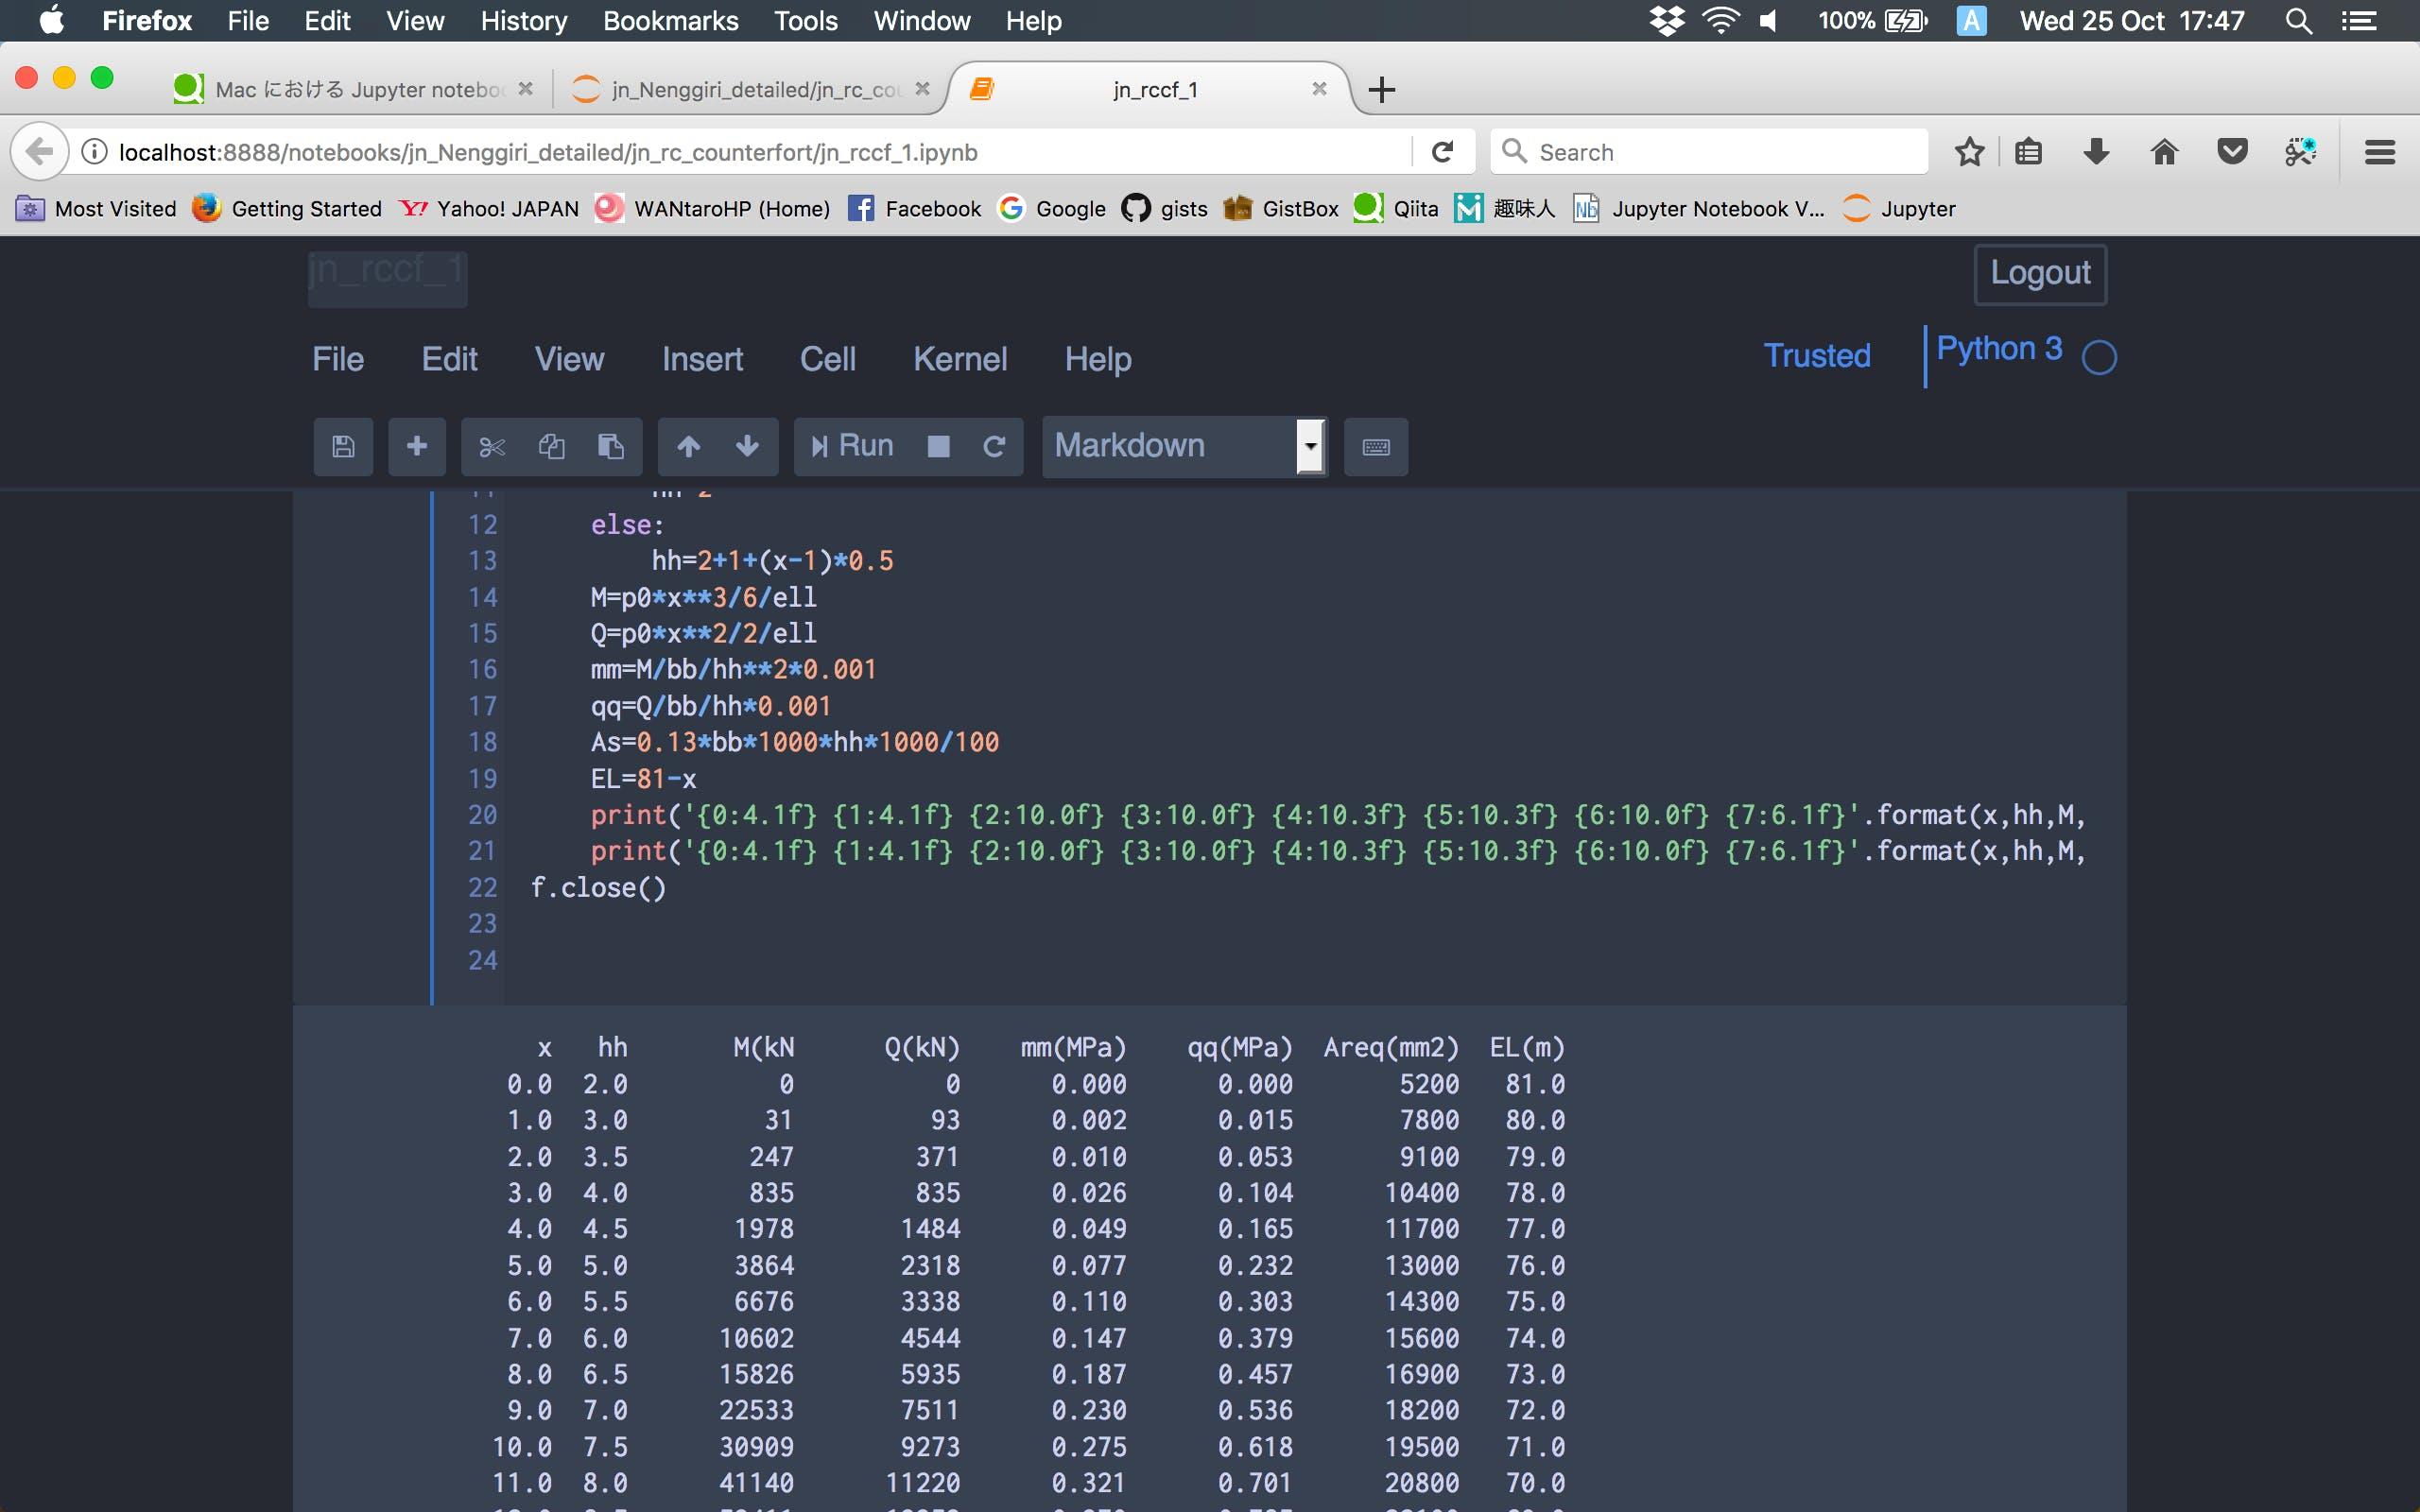 Screenshot 2017-10-25 17.47.21.png